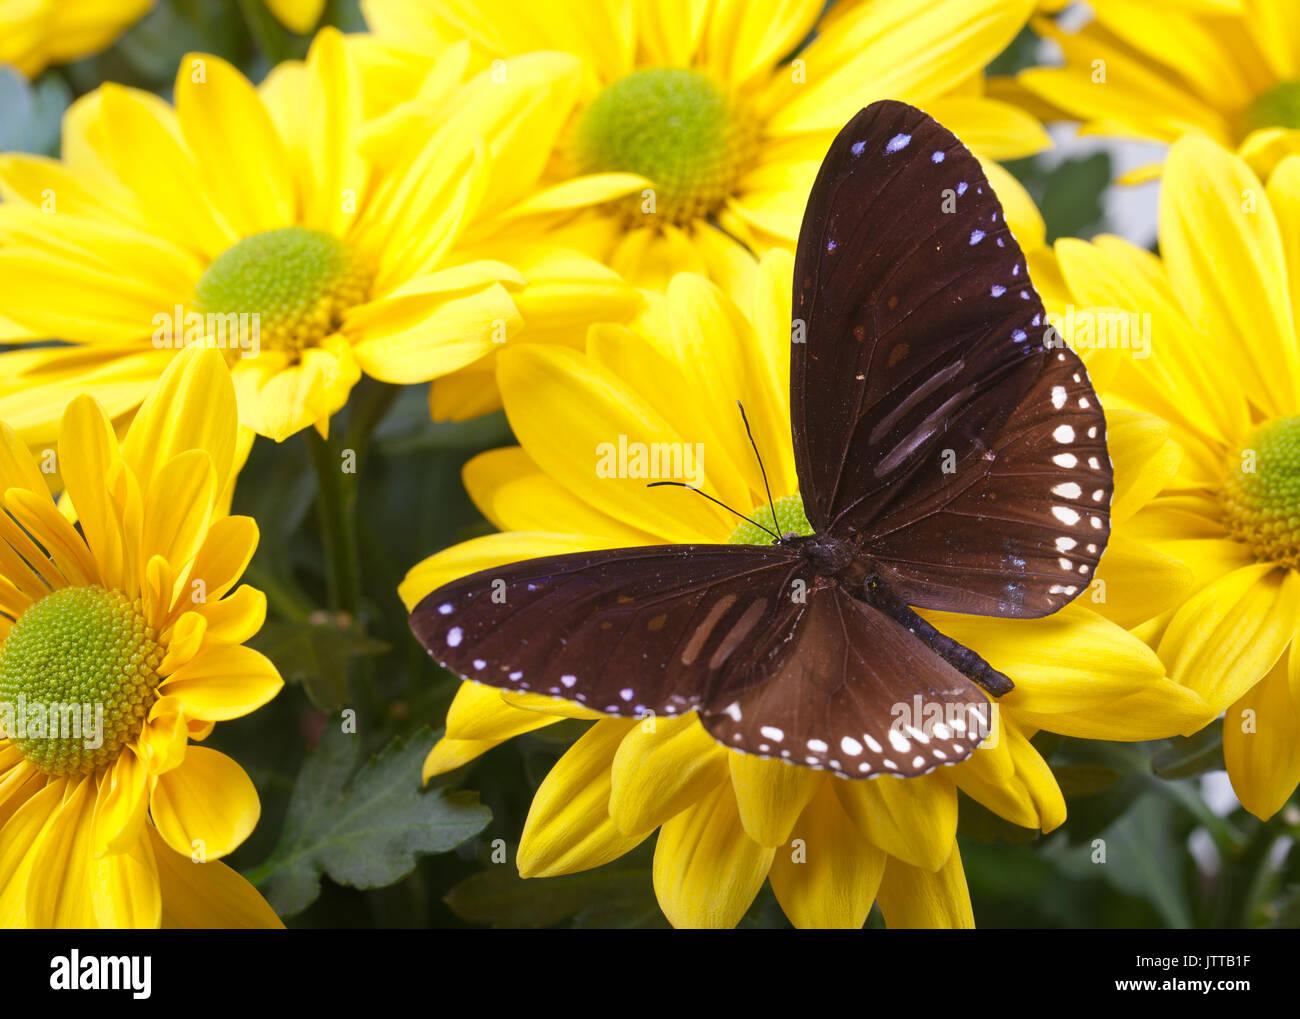 Striped Blue Crow Butterfly (Euploea sylvester harrisii) on Yellow Chrysanthemum - Stock Image